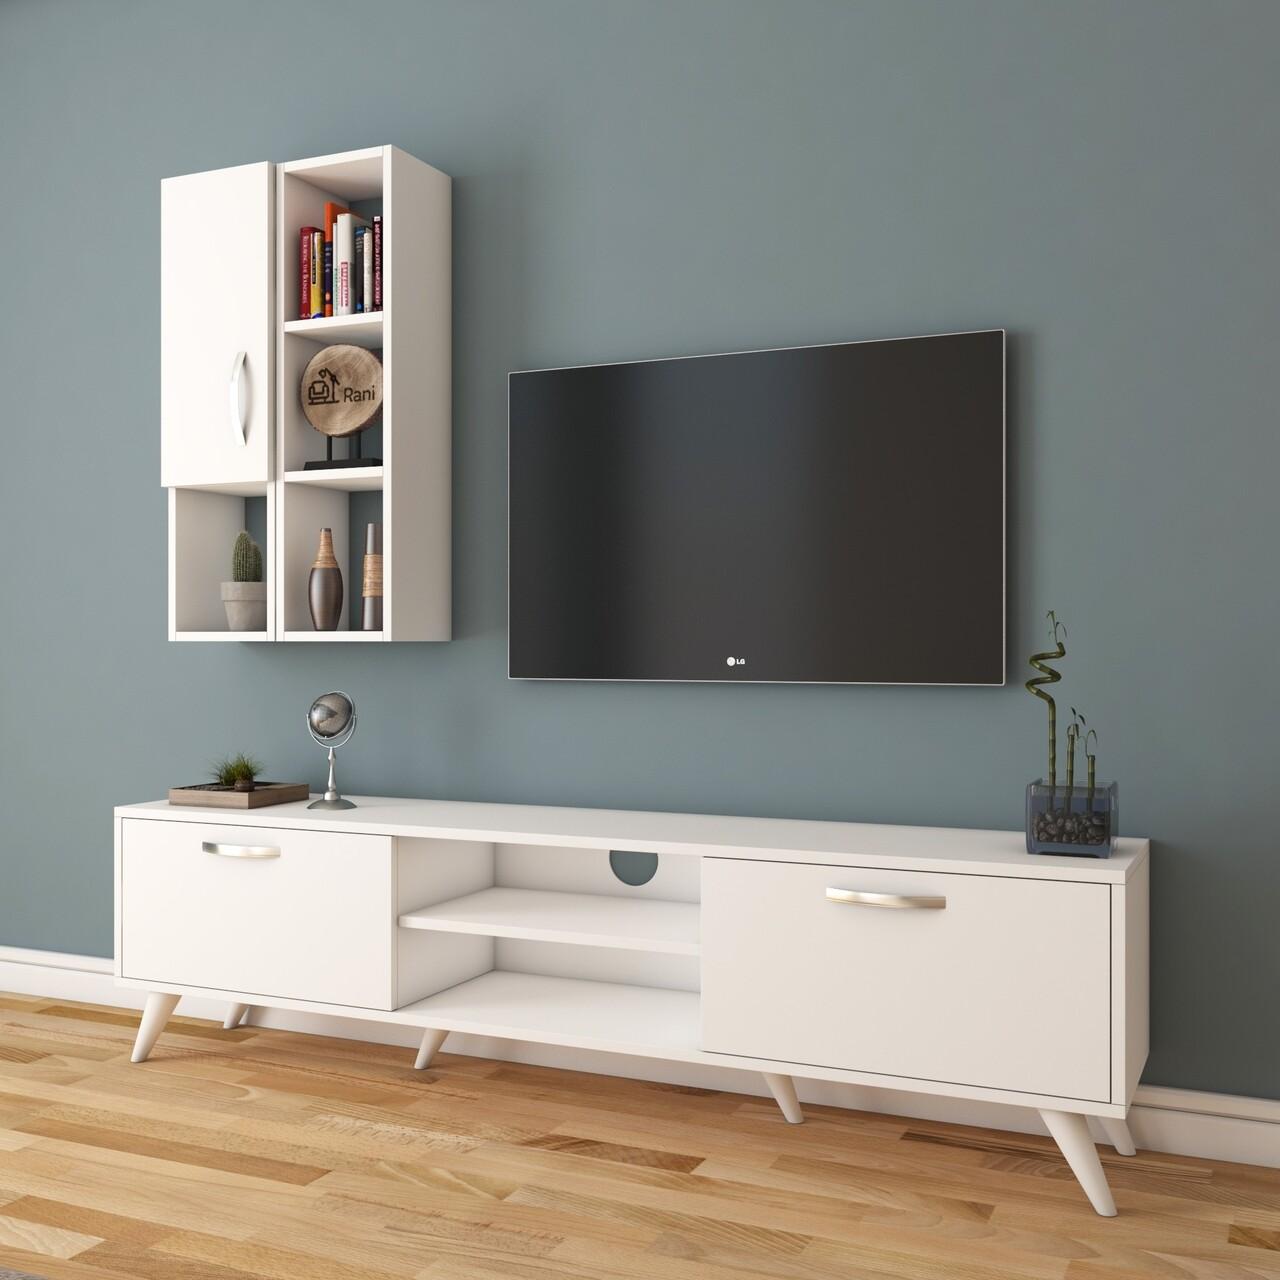 Comoda TV cu raft de perete si cabinet M38 - 304, Wren, 180 x 35 x 48.6 cm/90 cm, white